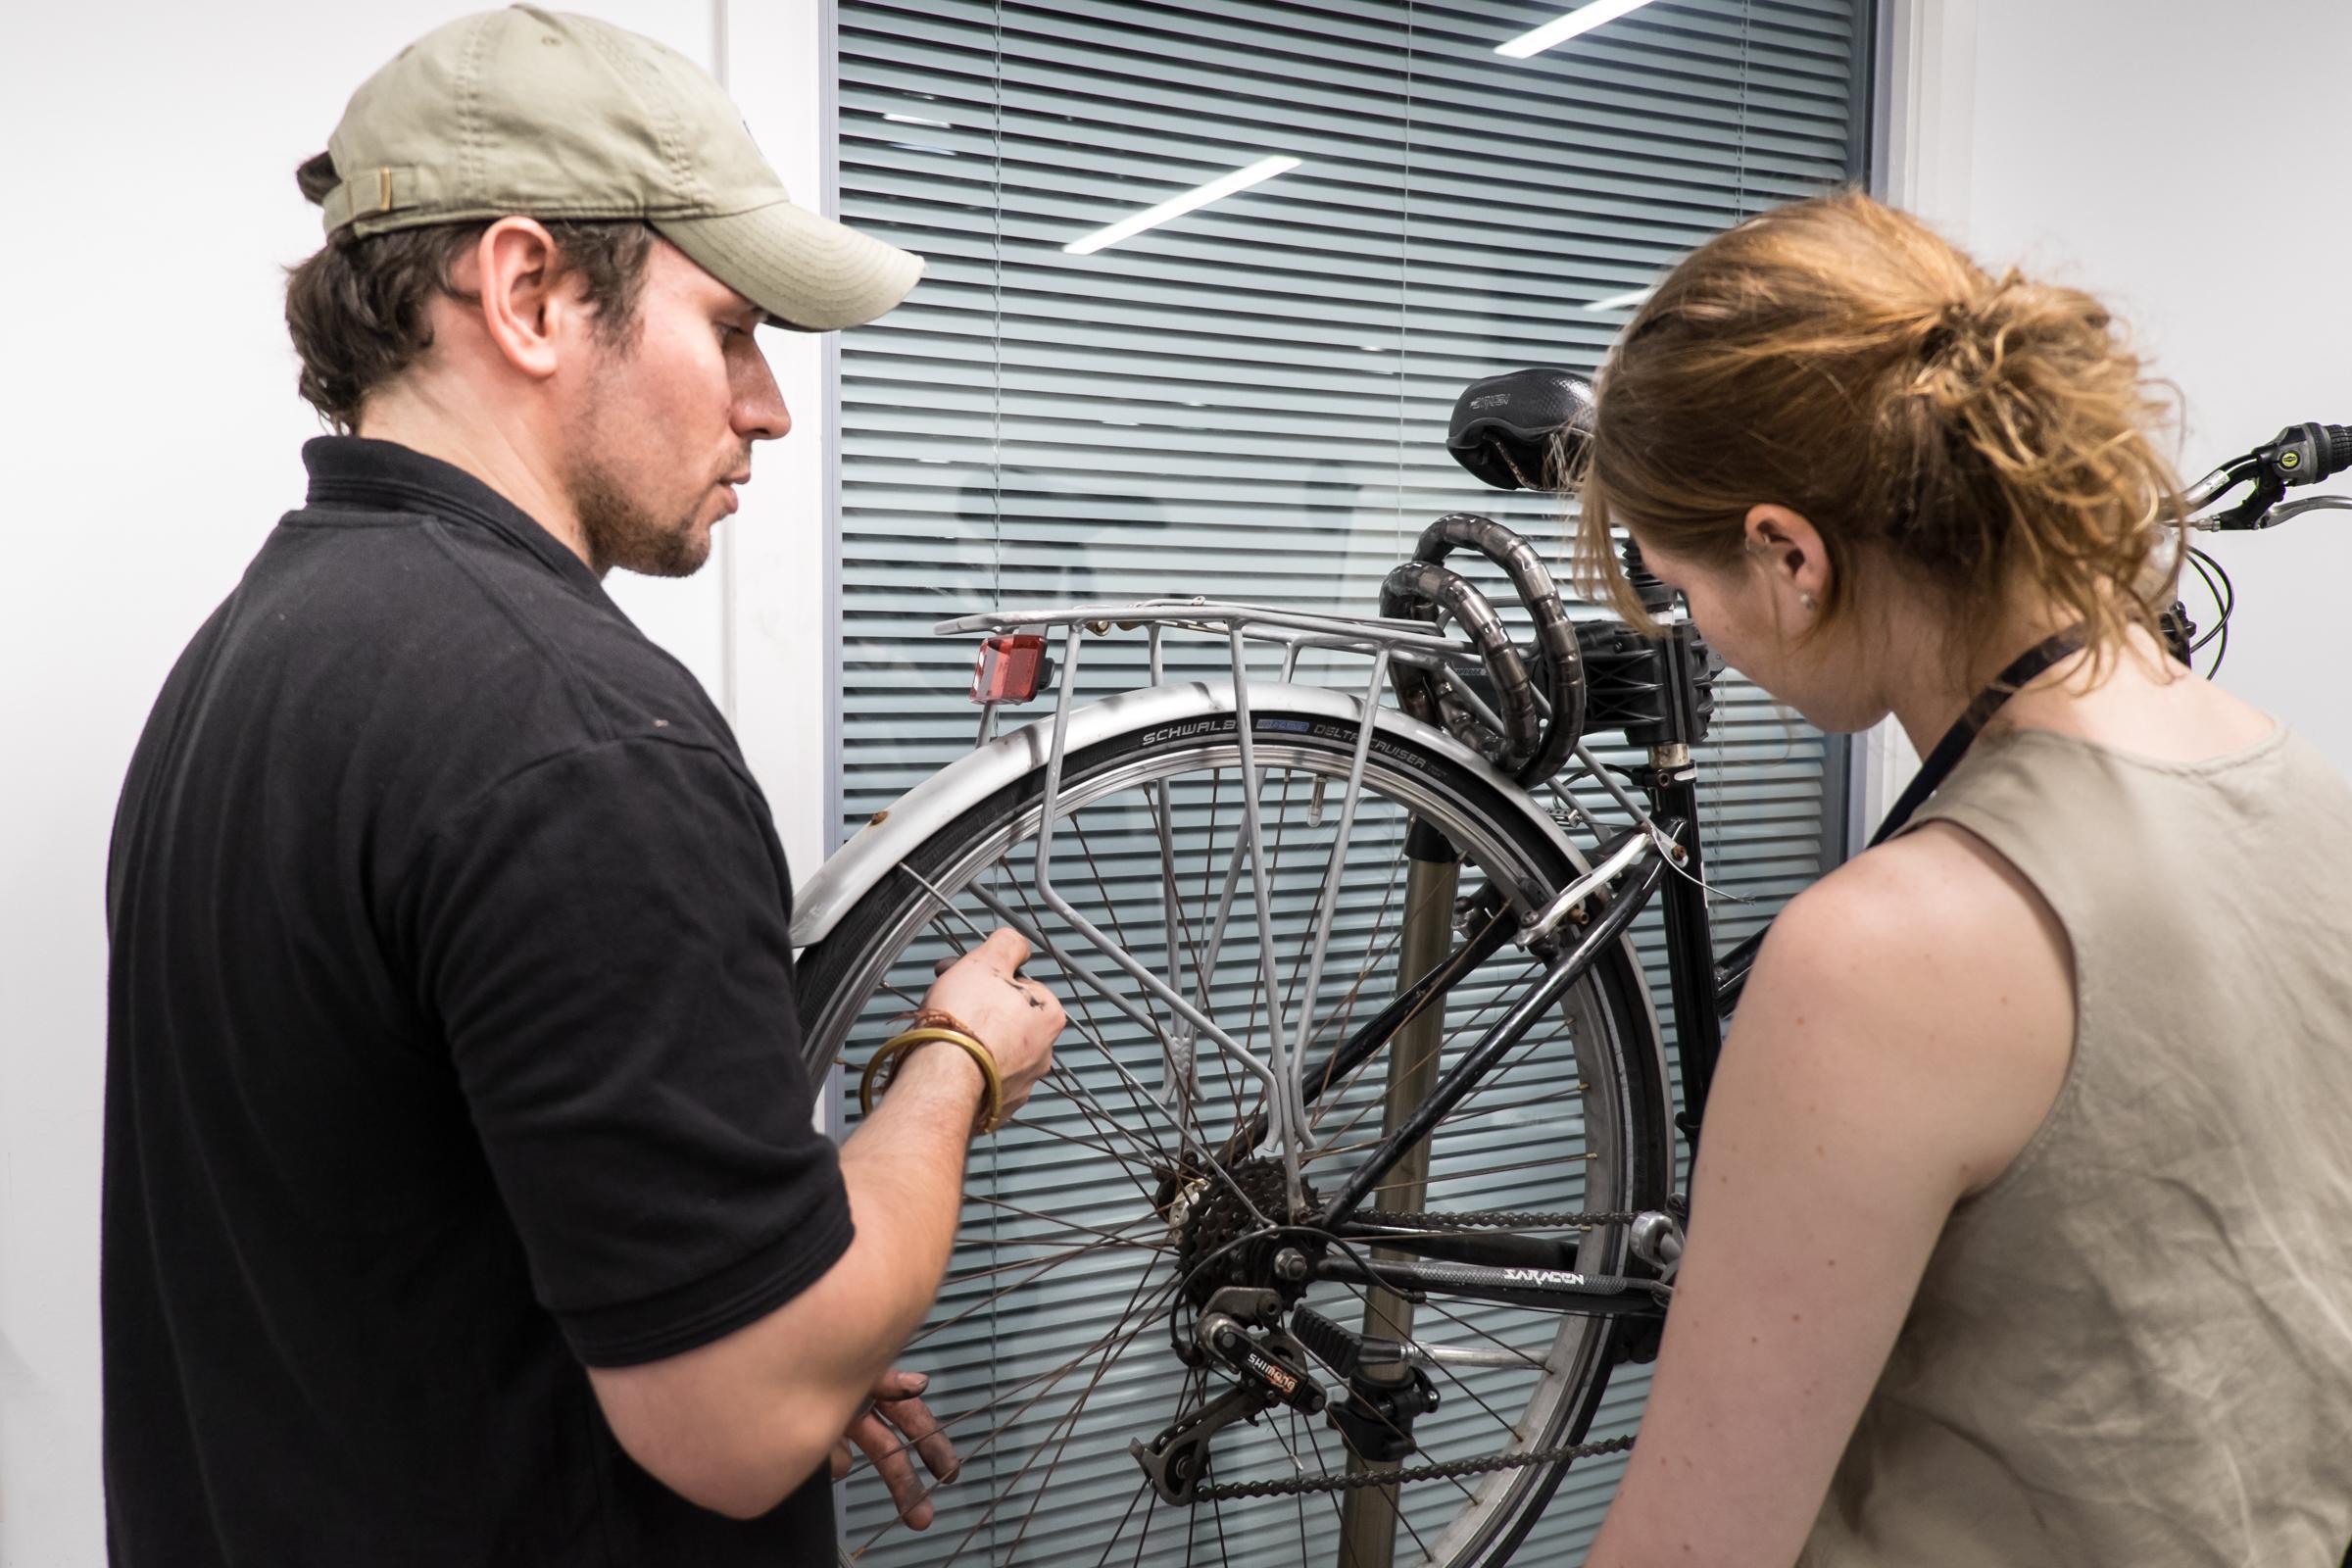 Basic bicycle maintenance [Eccles]